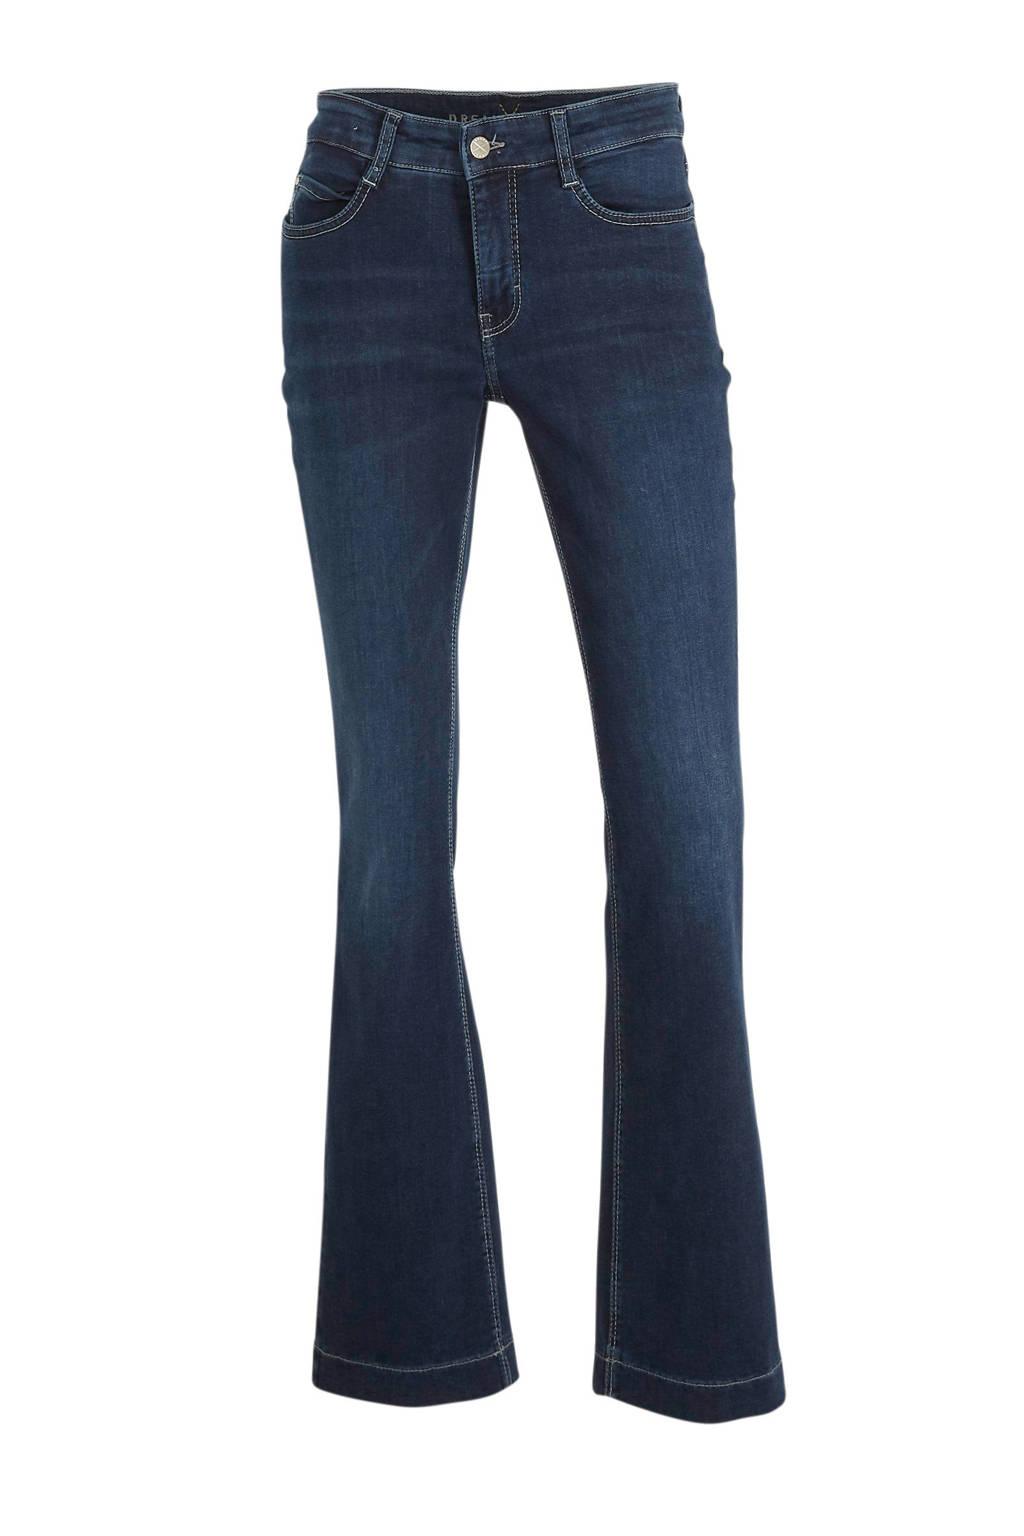 MAC low waist flared jeans donkerblauw, Donkerblauw